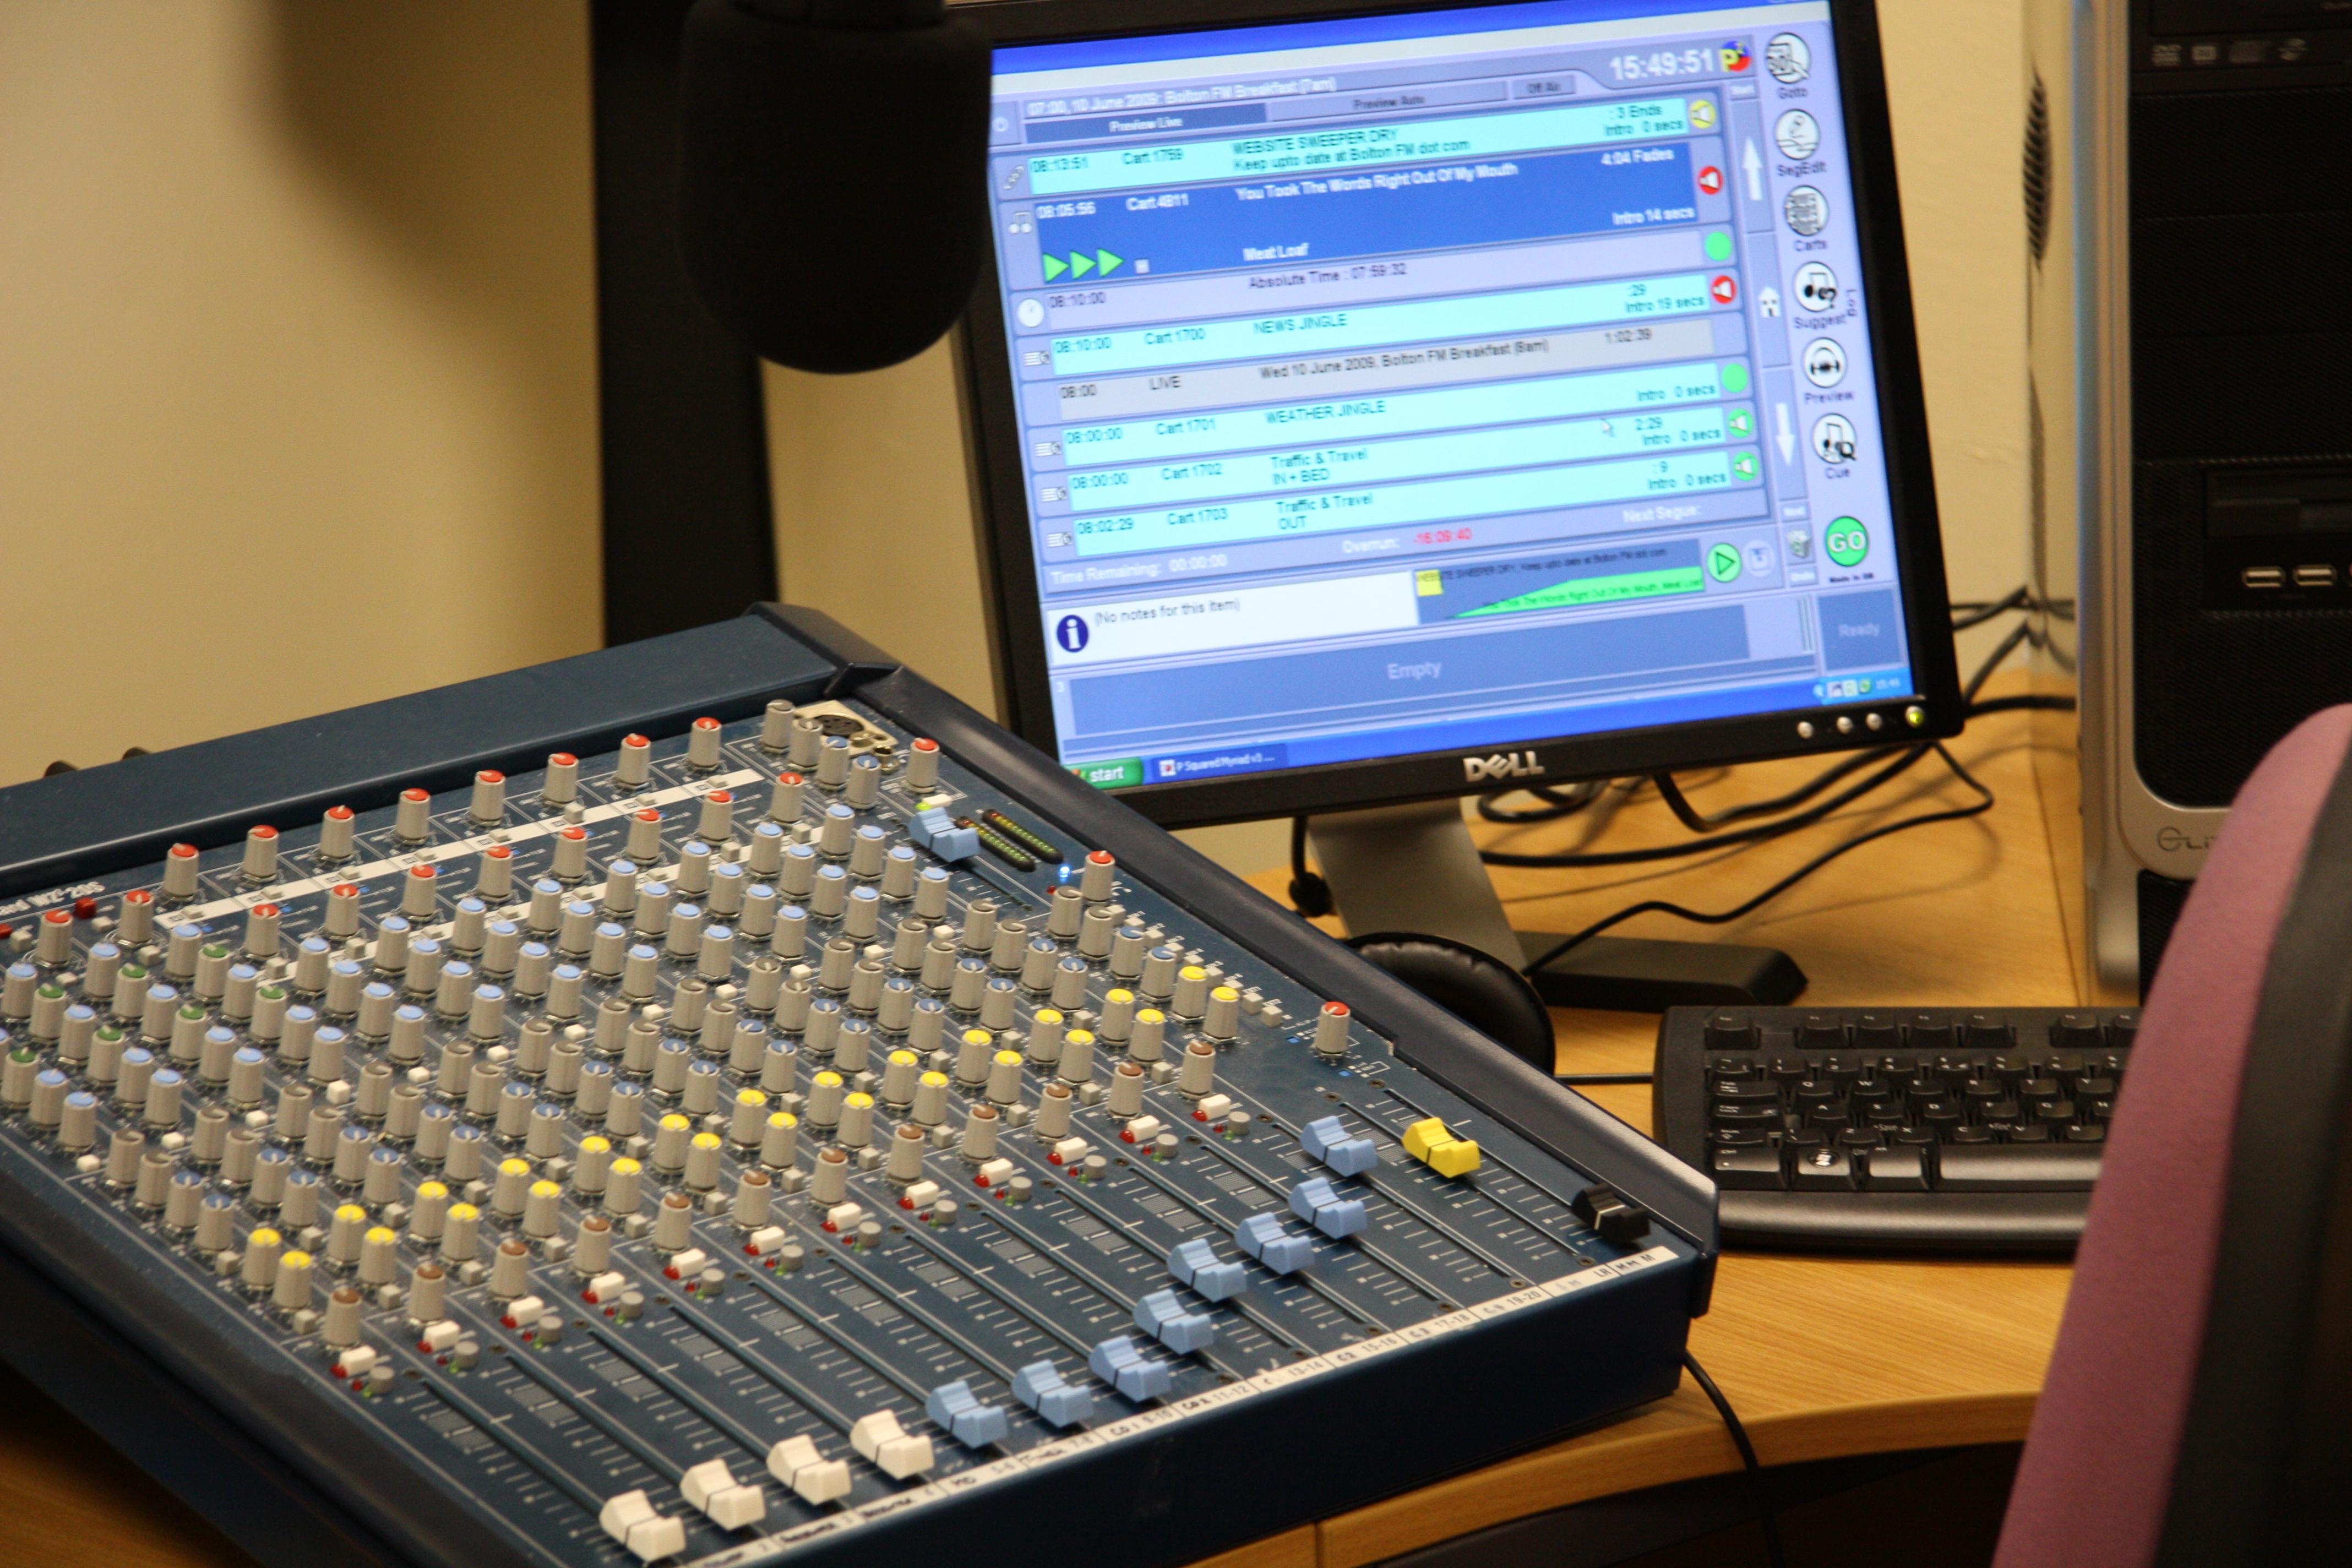 Table de mixage - Table de mixage studio d enregistrement ...